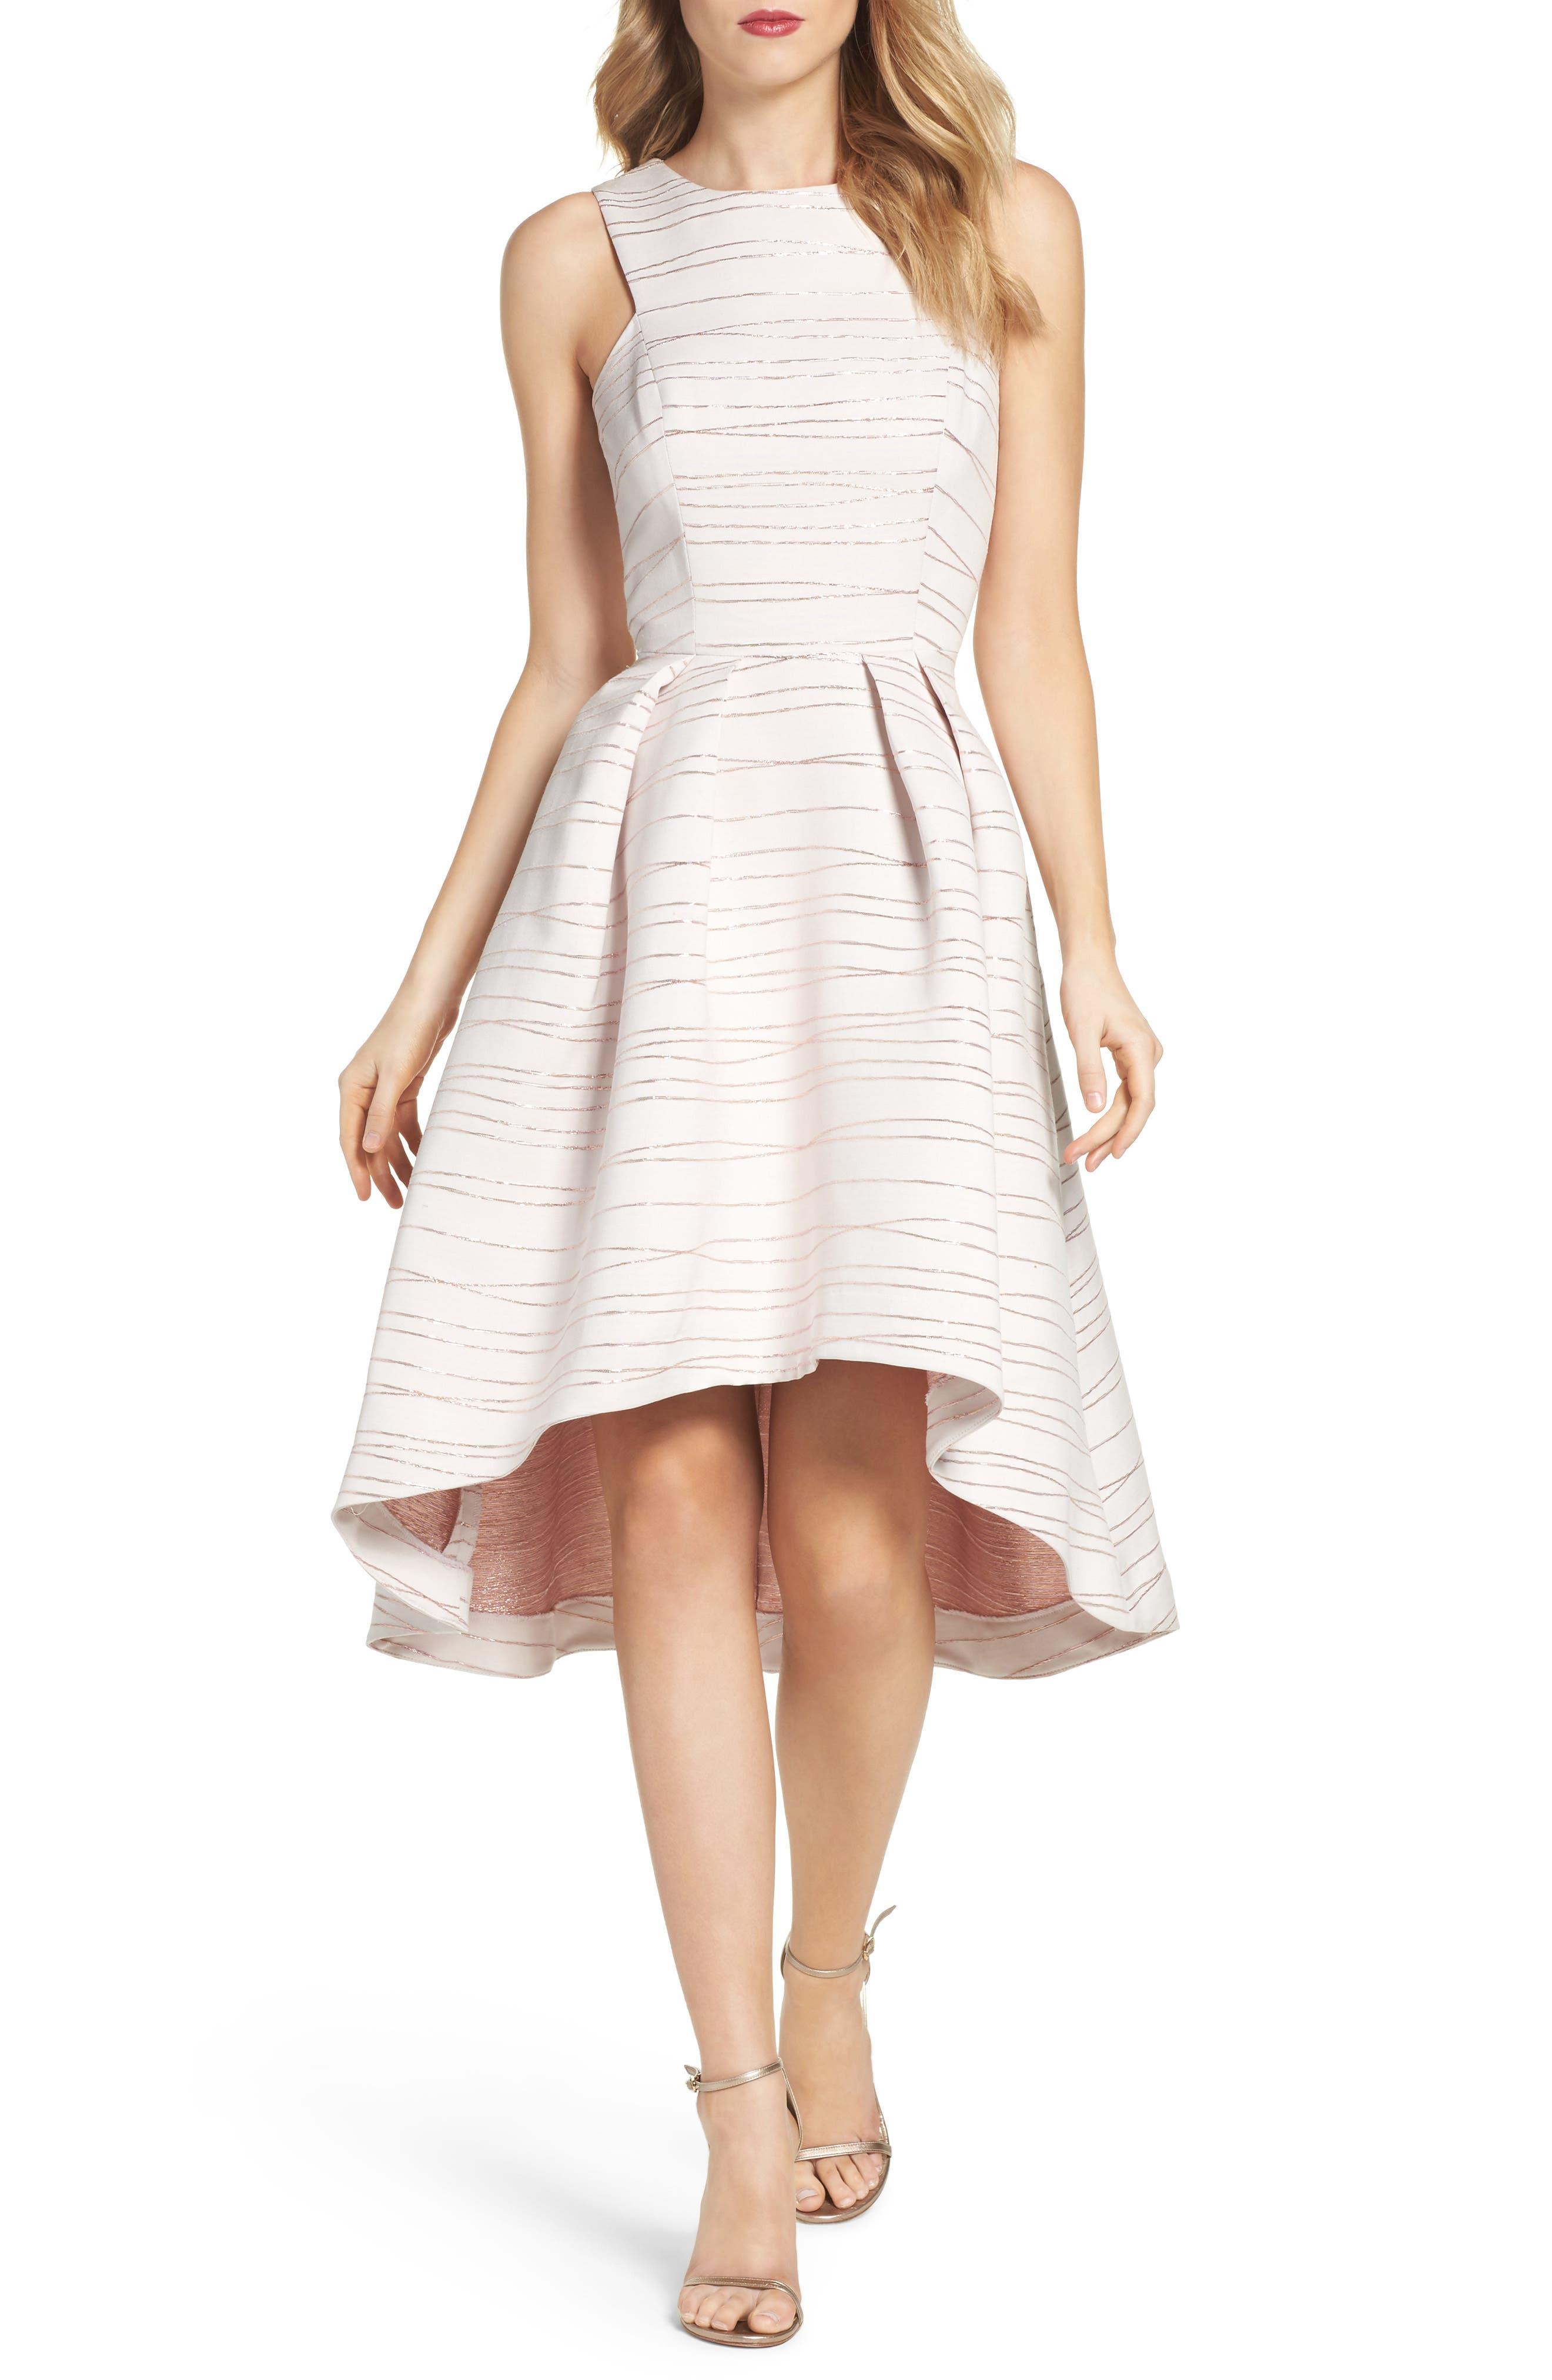 Alternate Image 1 Selected - Shoshanna Coraline Fit & Flare Dress